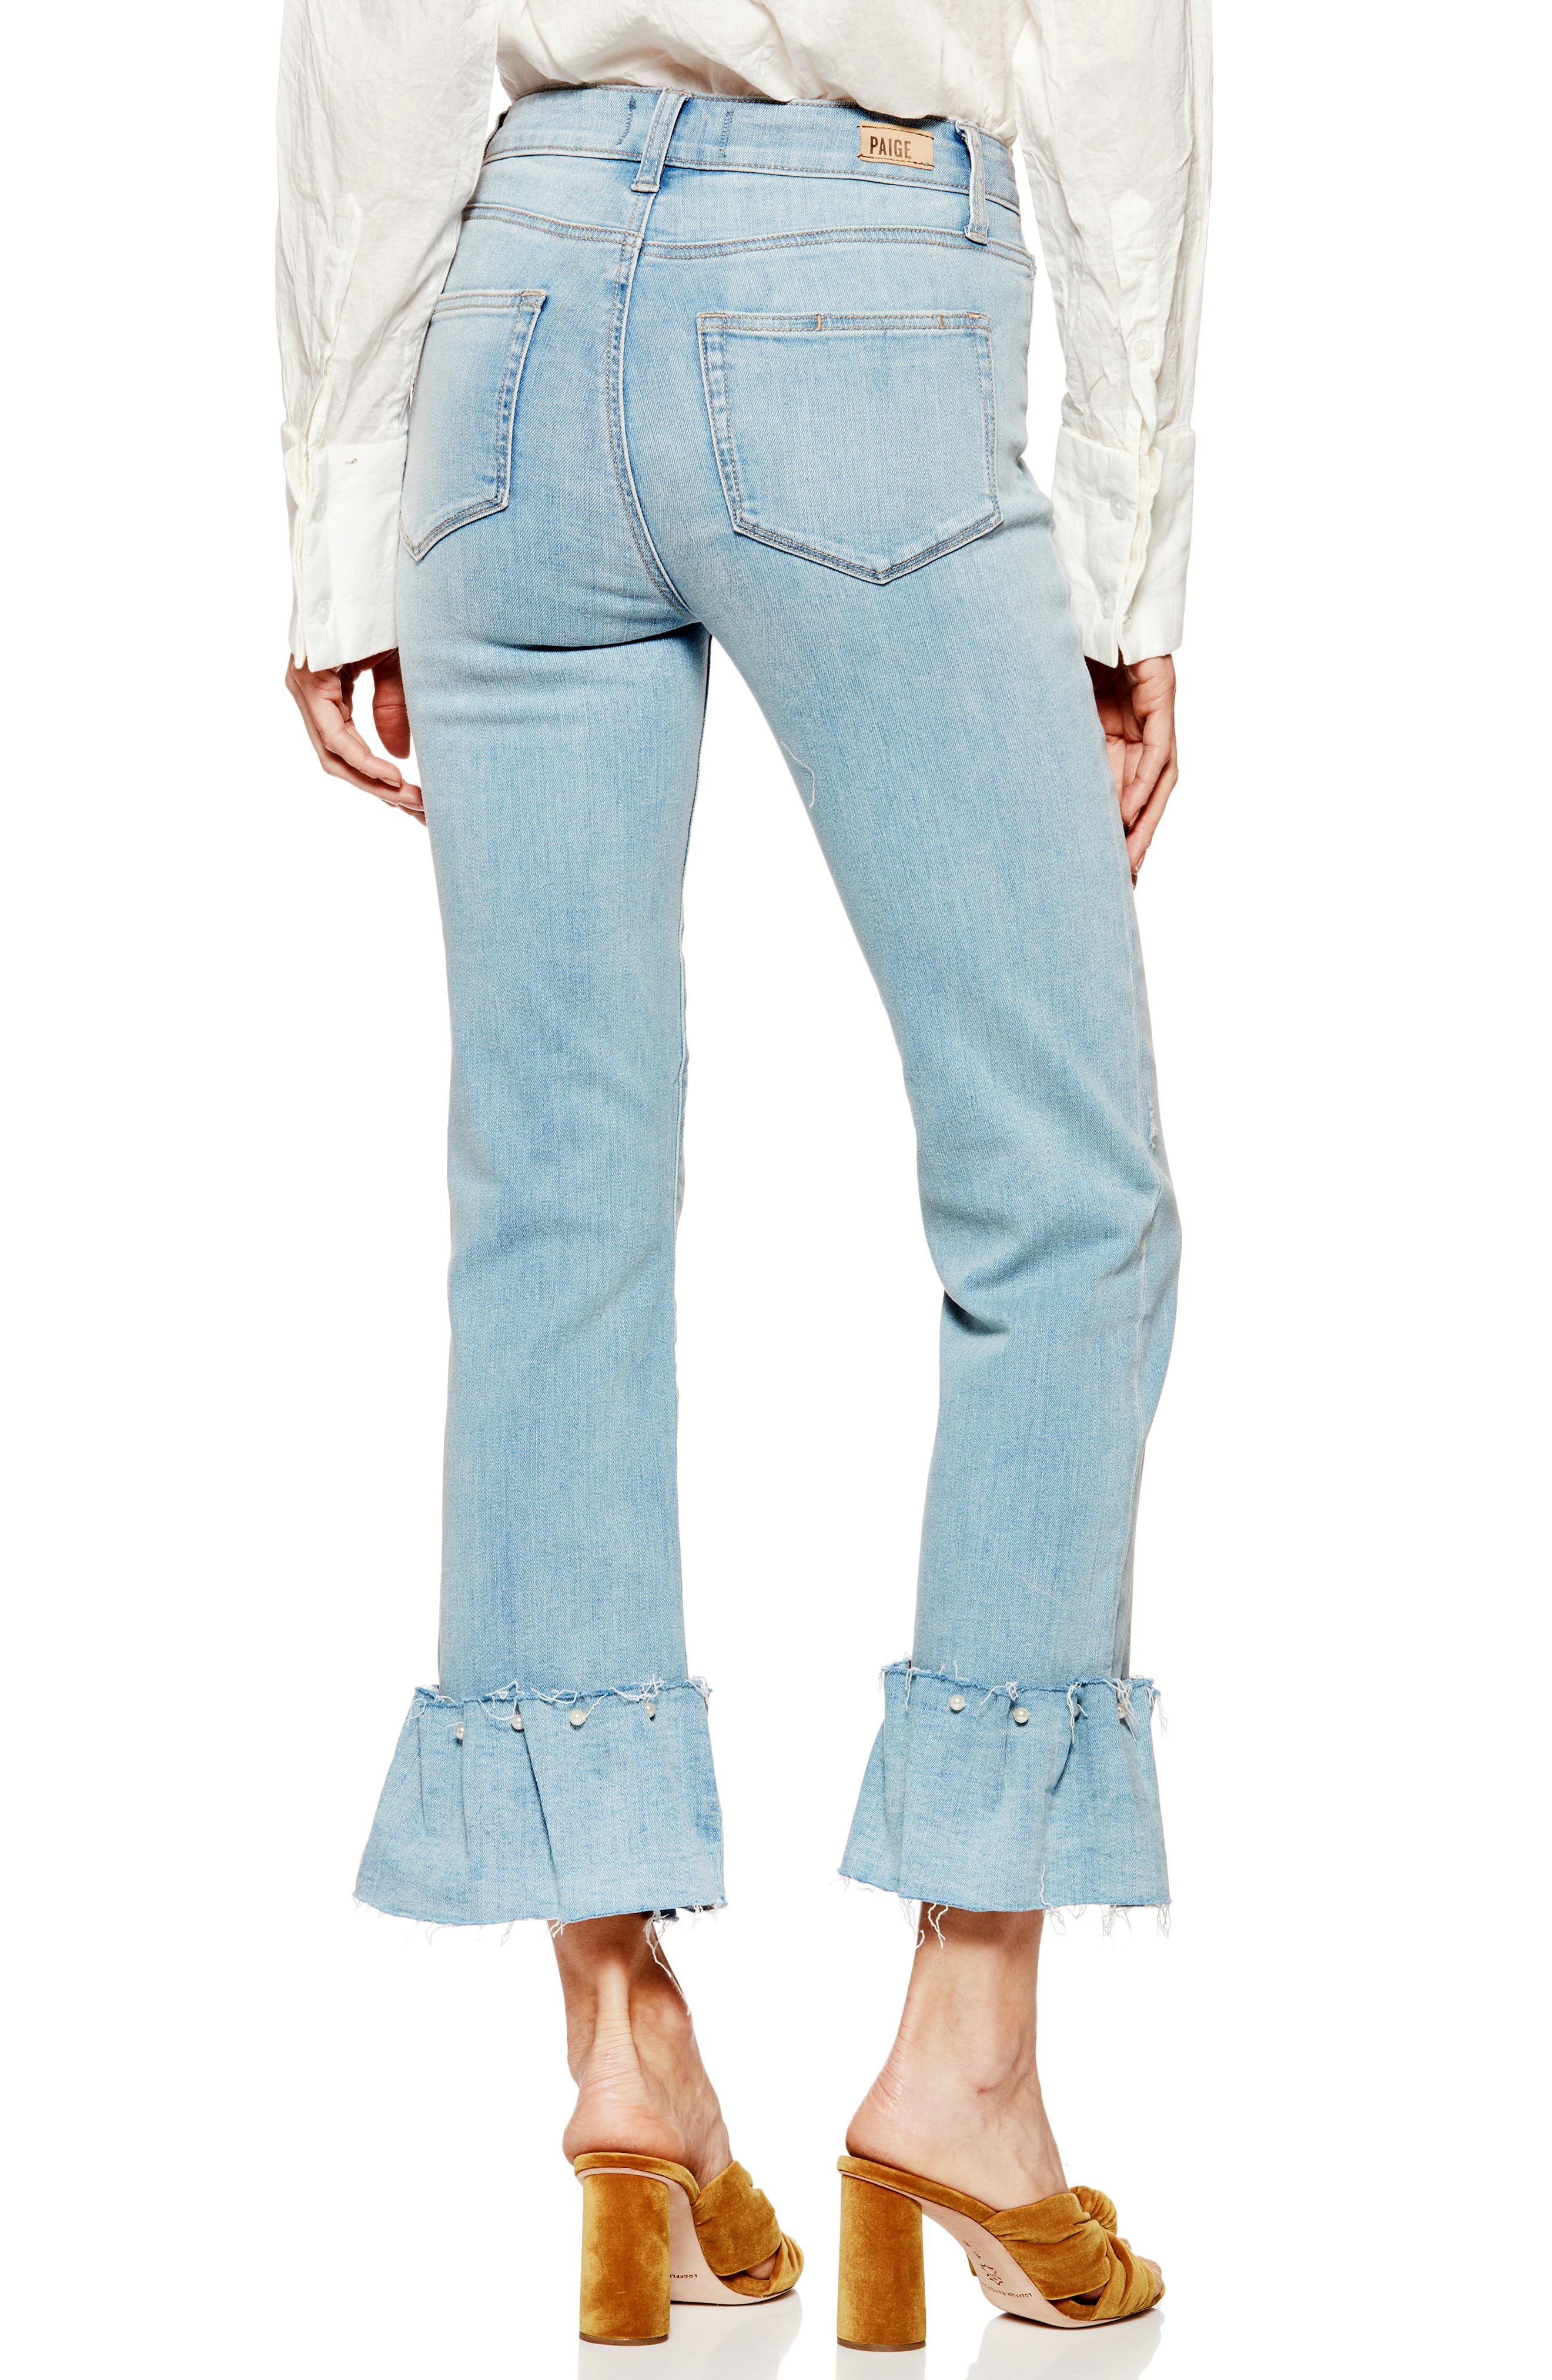 Transcend Vintage - Hoxton Embellished Ruffle High Waist Jeans,                             Alternate thumbnail 2, color,                             Palms